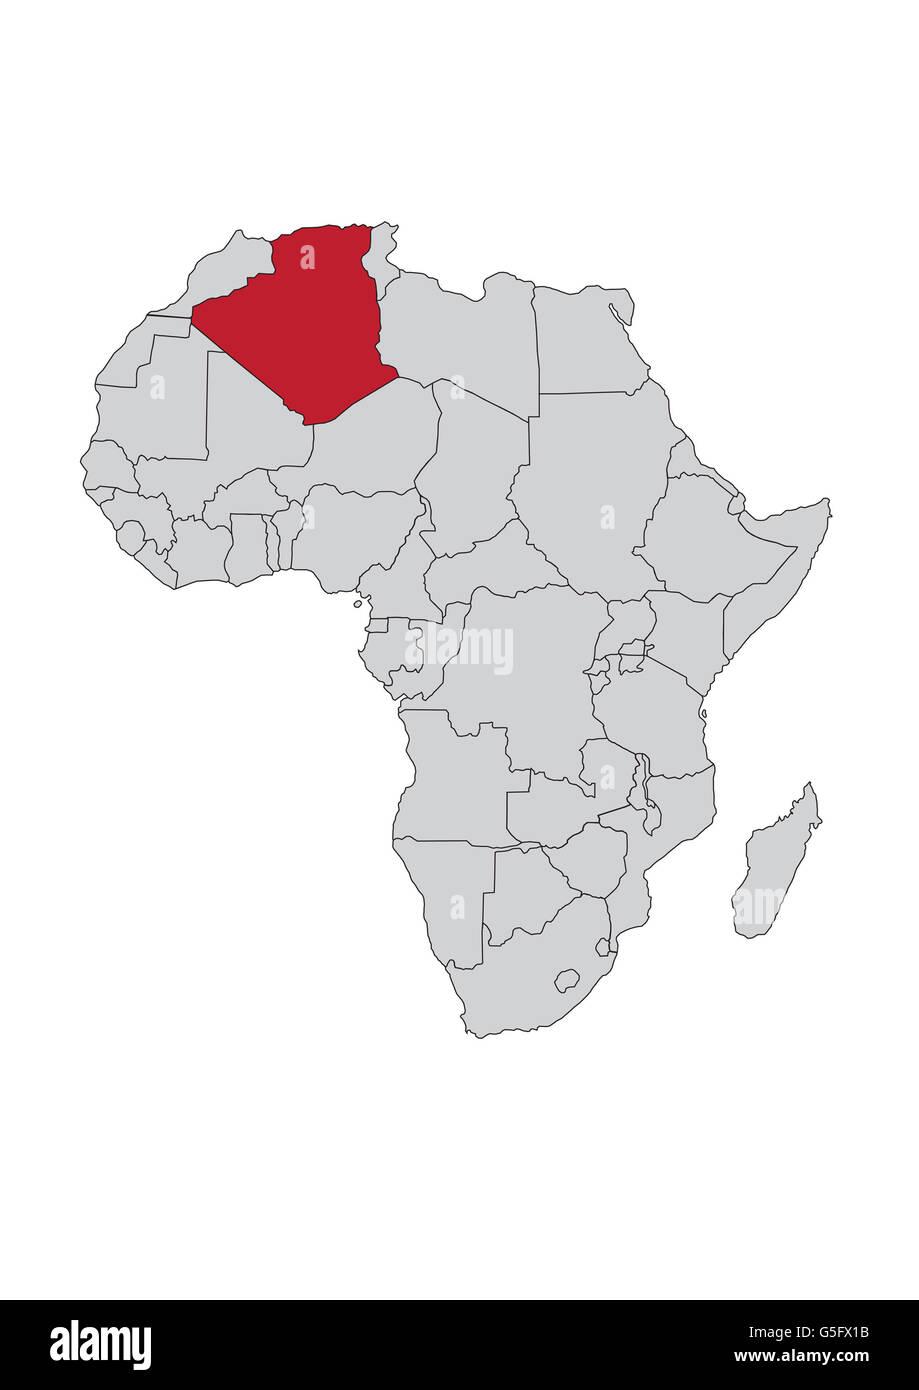 algeria on africa map Map Of Africa Algeria Stock Photo Alamy algeria on africa map